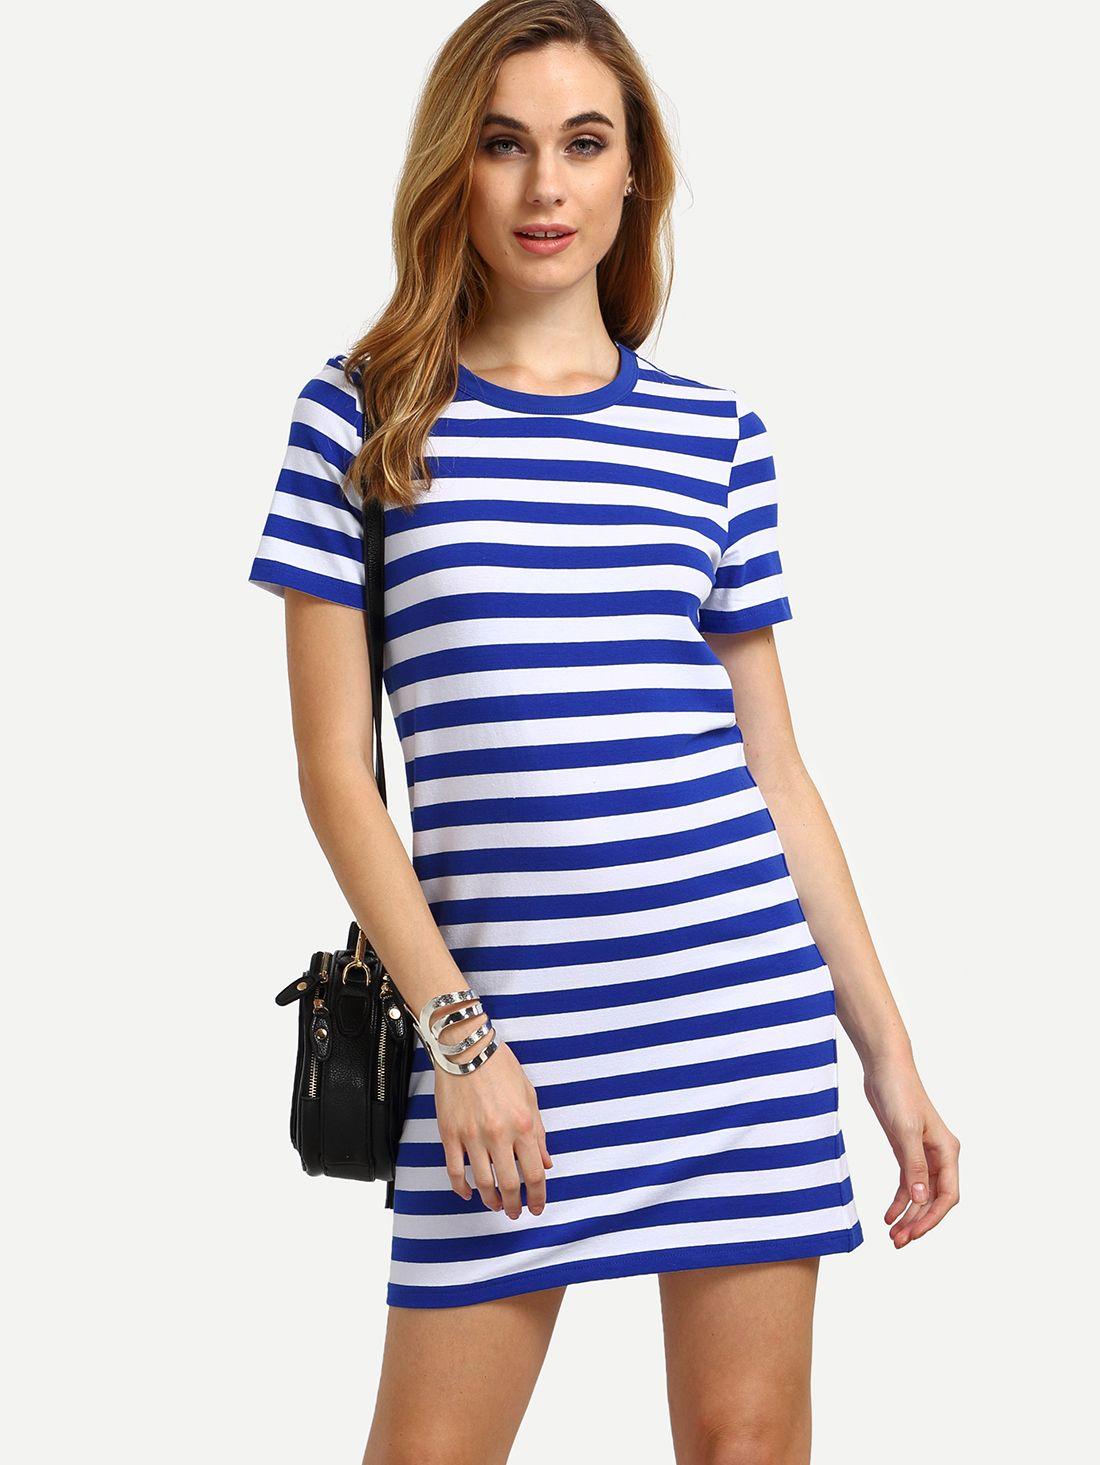 Multicolor Short Sleeve Striped Casual Dress Shein Sheinside Striped Casual Dresses Casual Dress Dresses [ 1465 x 1100 Pixel ]